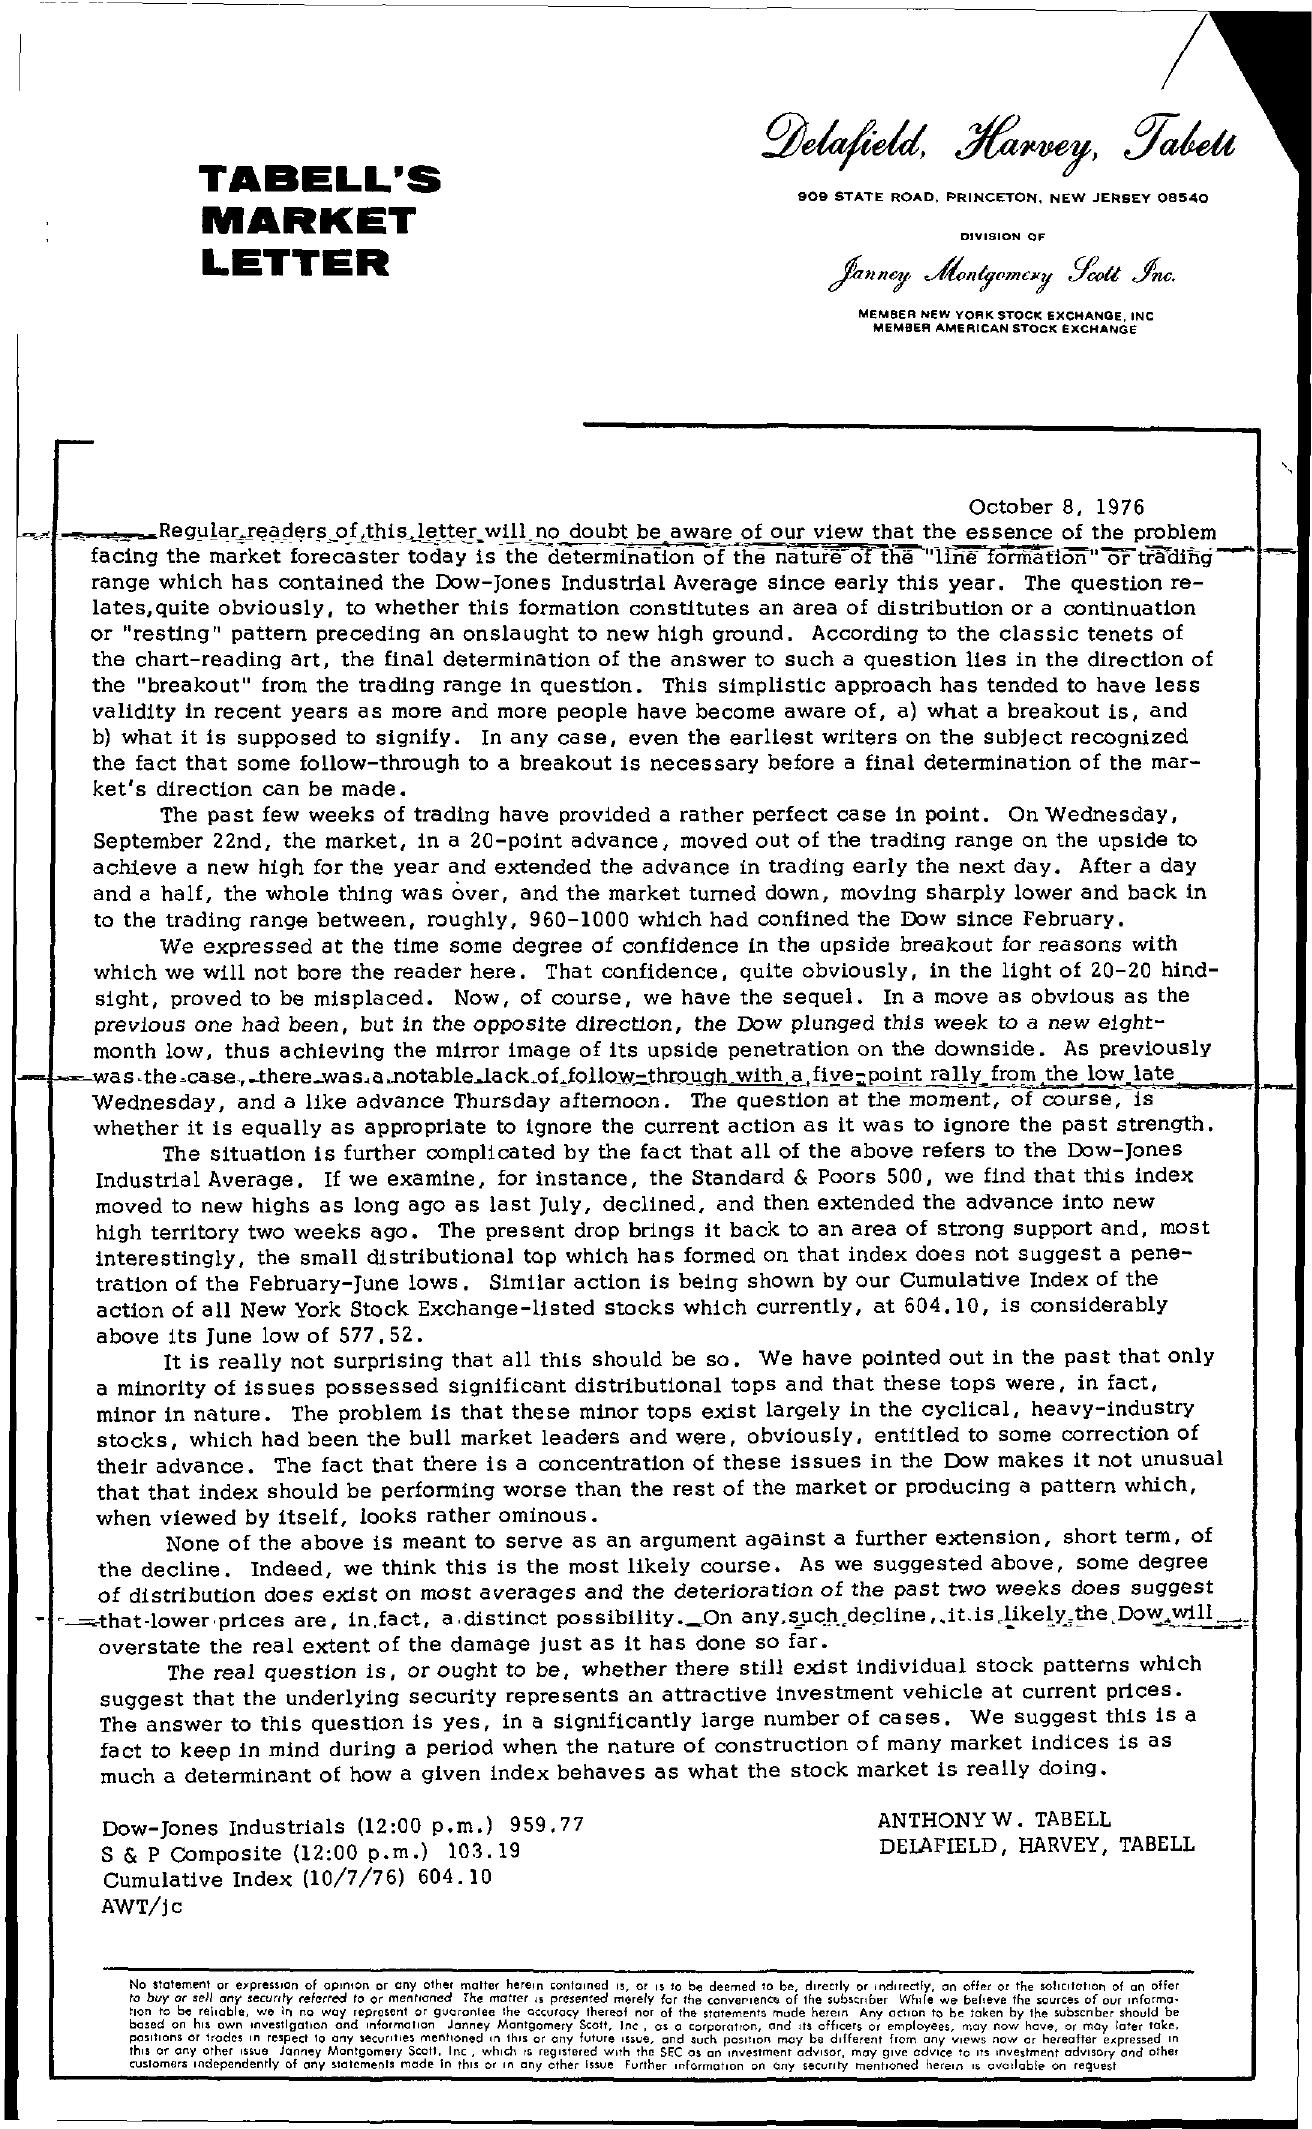 Tabell's Market Letter - October 08, 1976